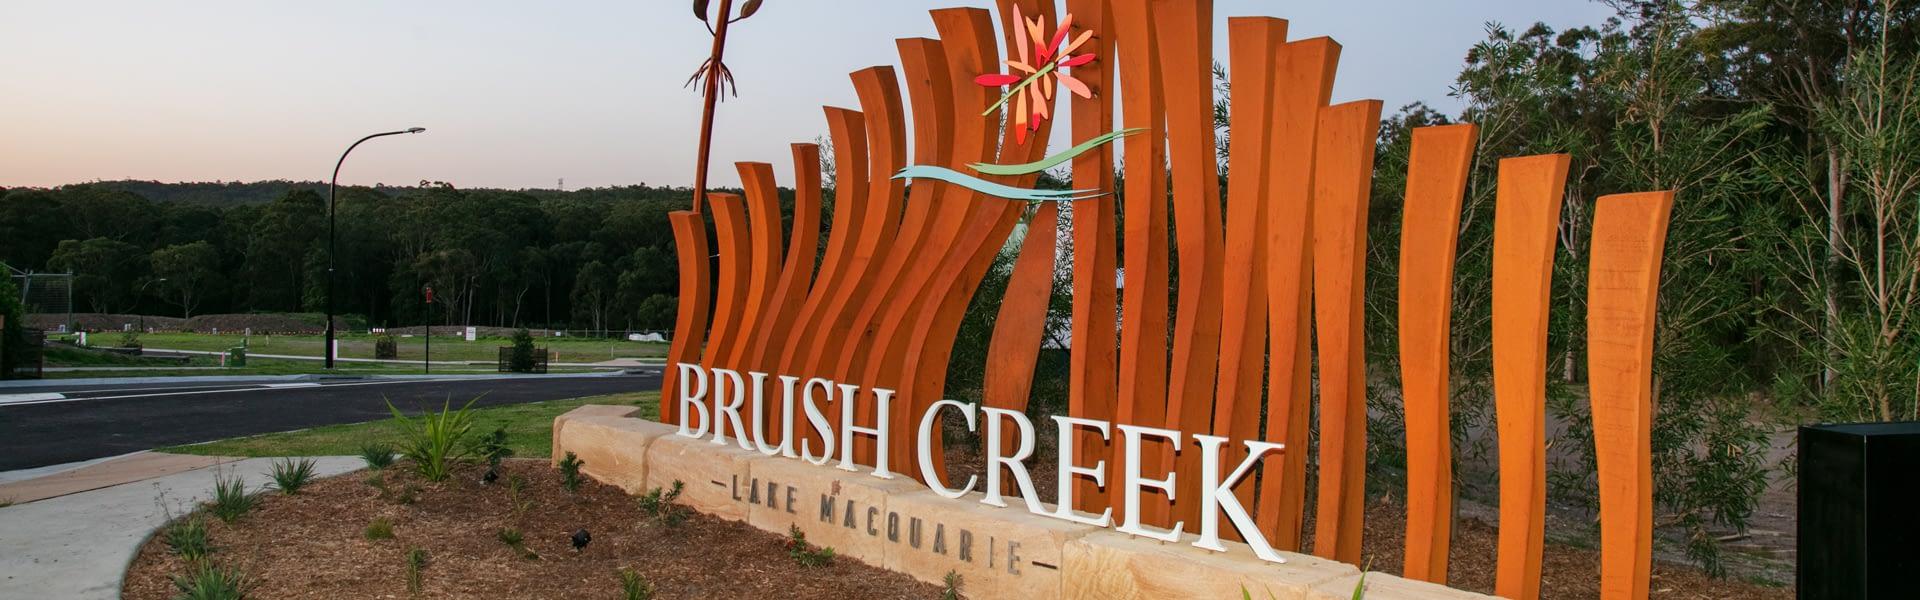 Brush Creek Edgeworth Land For Sale Newcastle